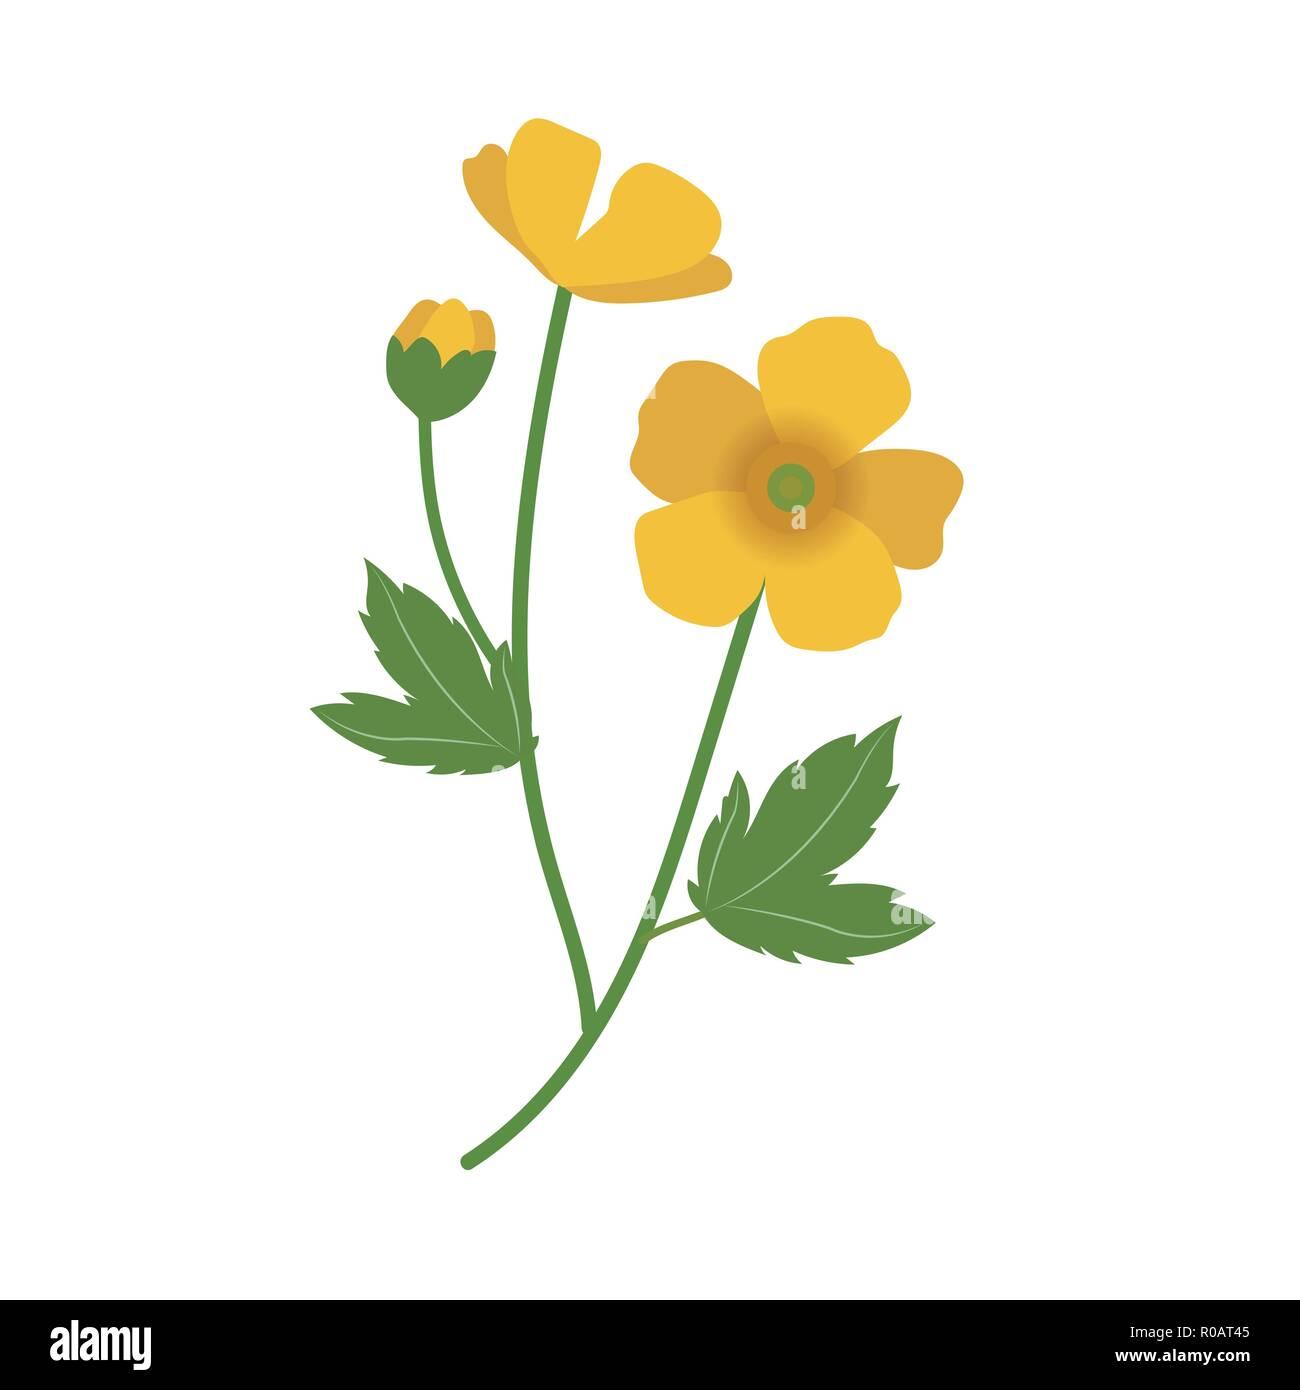 69ebf20152ce4 Nature flower buttercup, vector botanic garden floral leaf plant ...